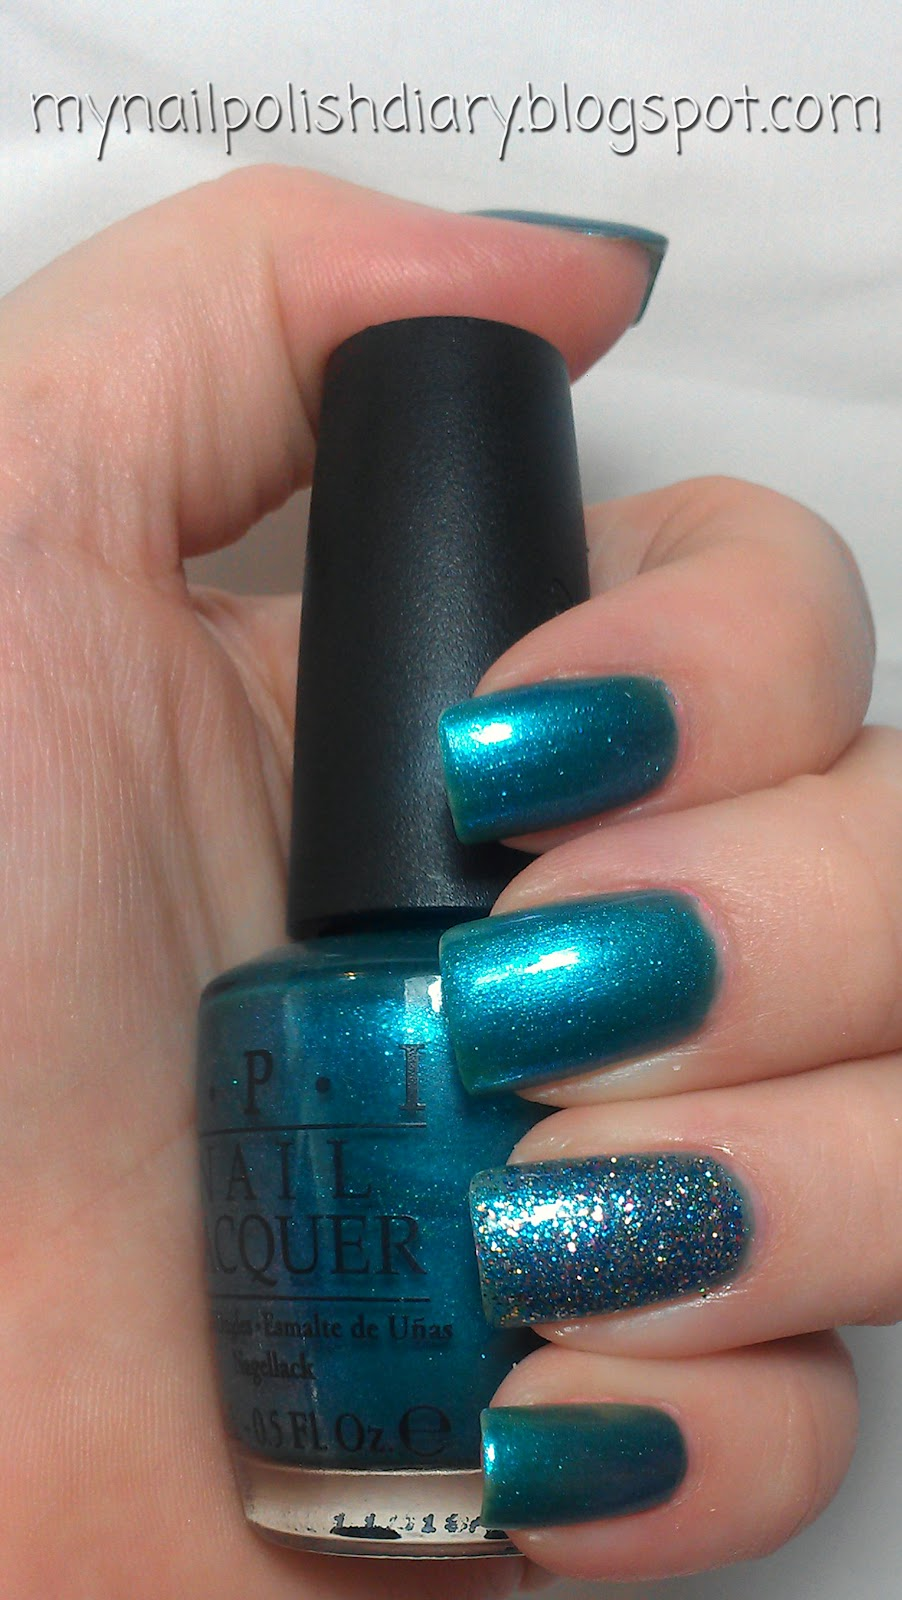 My Nail Polish Obsession My Birthday Nails: My Nail Polish Diary: OPI Austin-tatious Turquoise And OPI